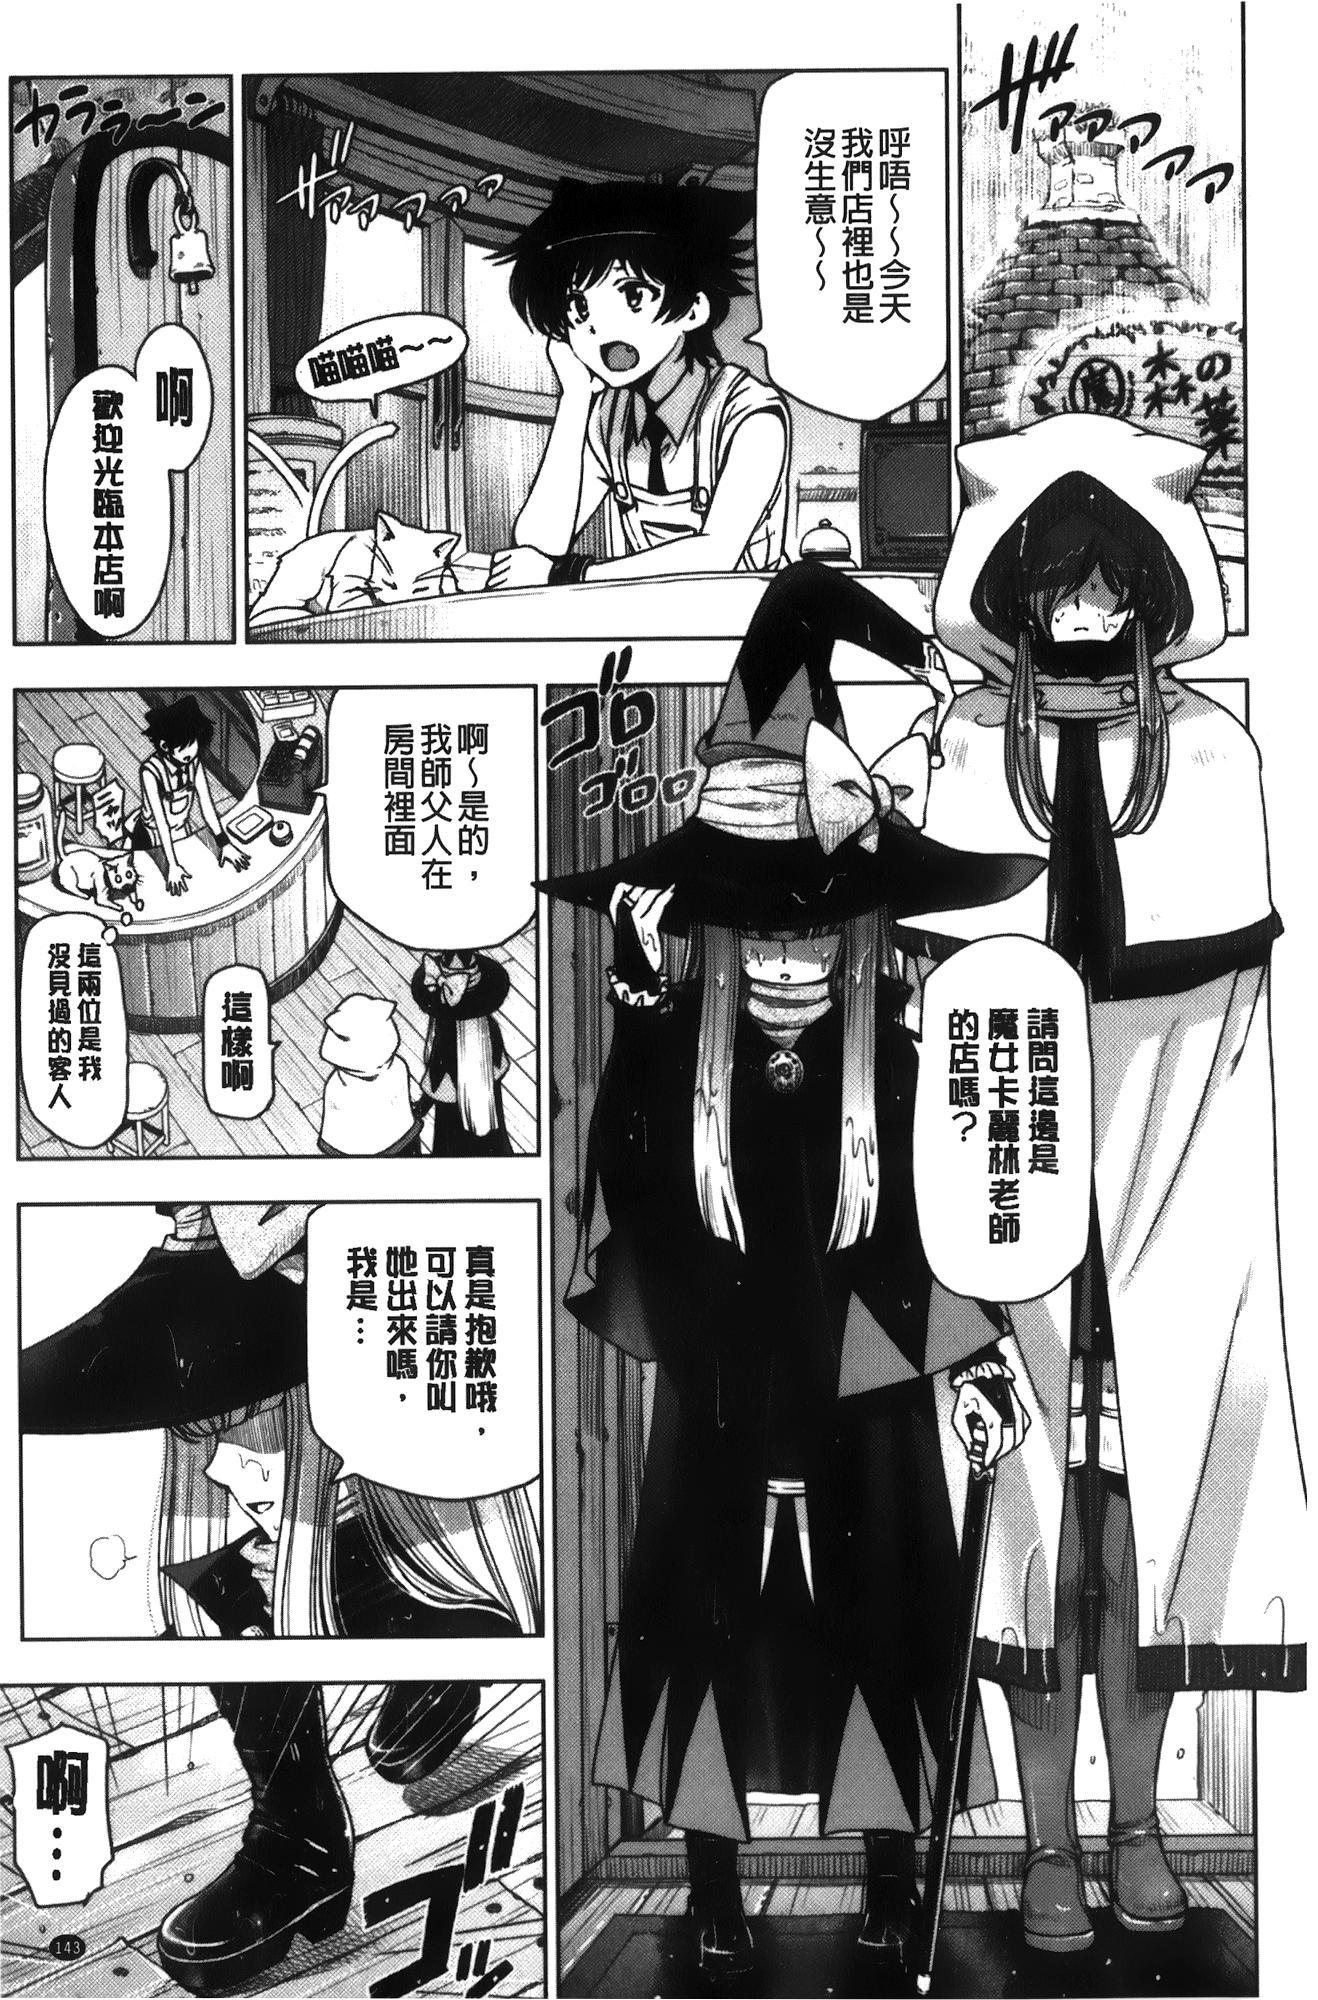 Majo × Shota ~ Genteiban | 魔女X小正太 限定版 151